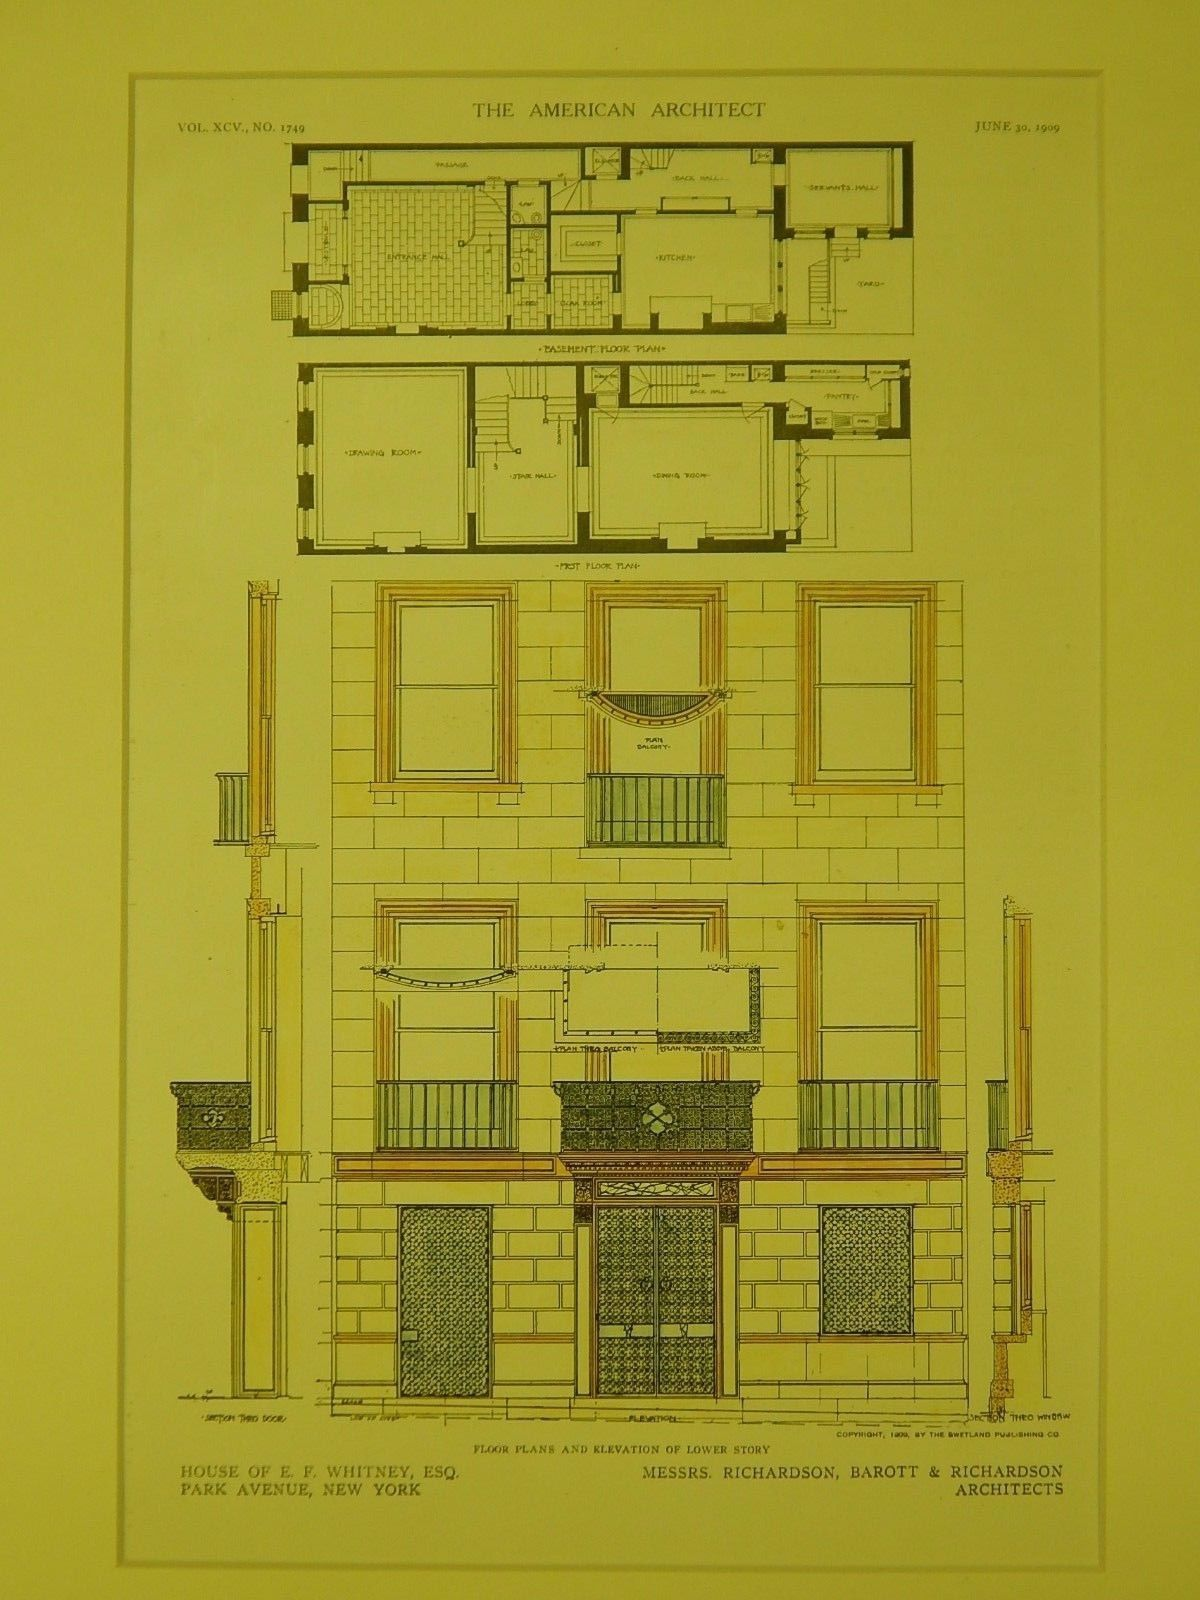 Floor Plans Elevation E F Whitney House New York Ny 1909 Original Plan Richardson Barott Richardson Whitney House Floor Plans How To Plan